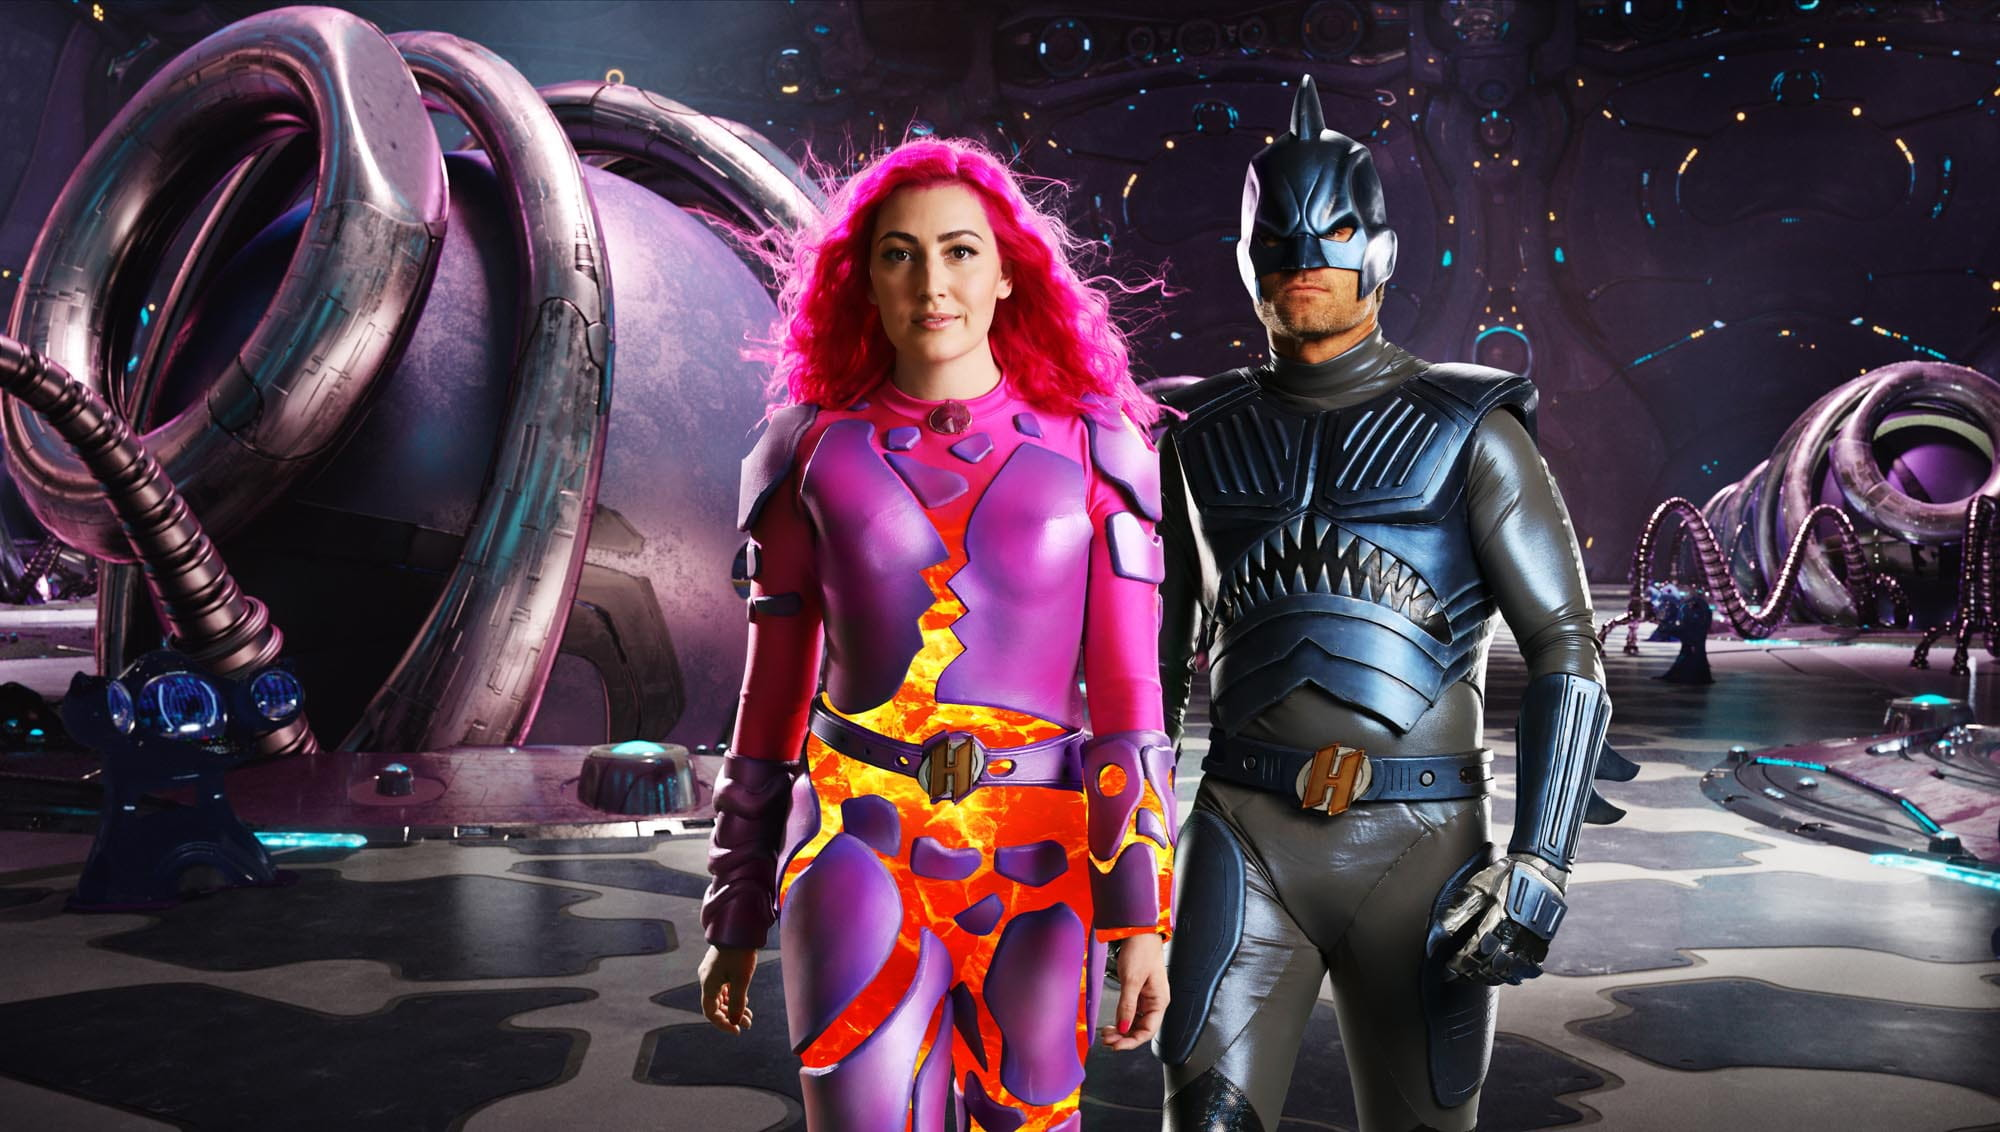 We Can Be Heroes | Netflix divulga imagens de Sharkboy e Lavagirl adultos